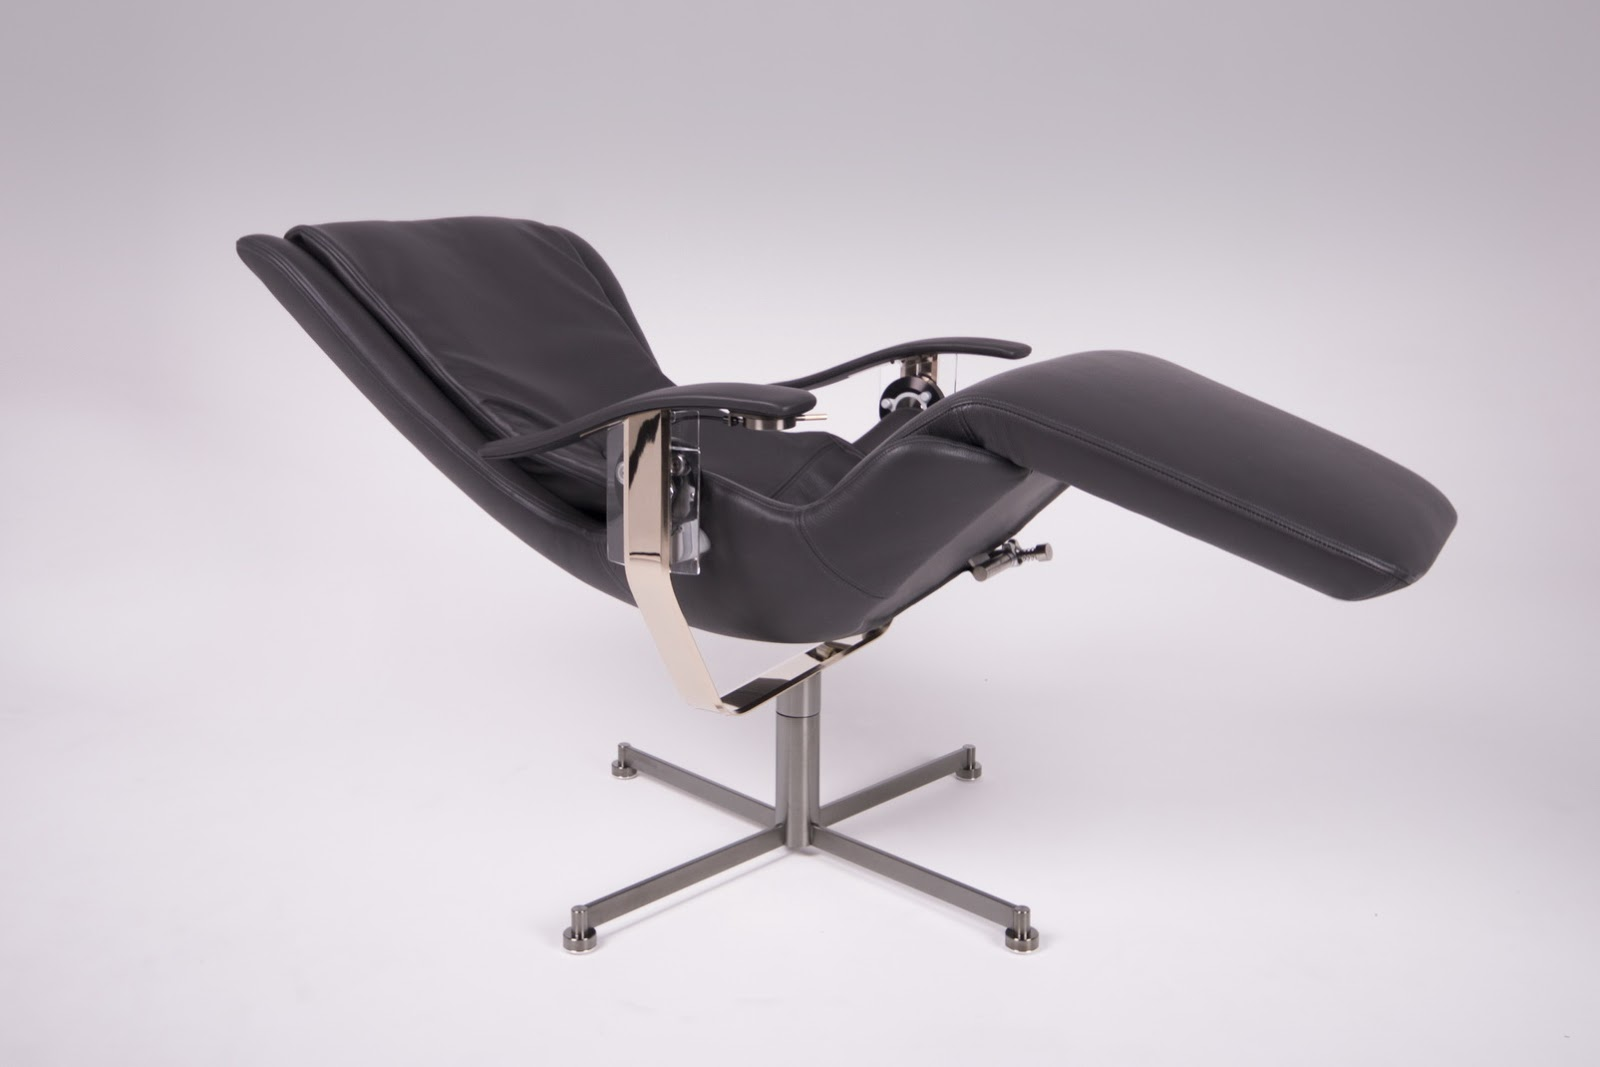 rolls-elysium-r-advanced-seat-5